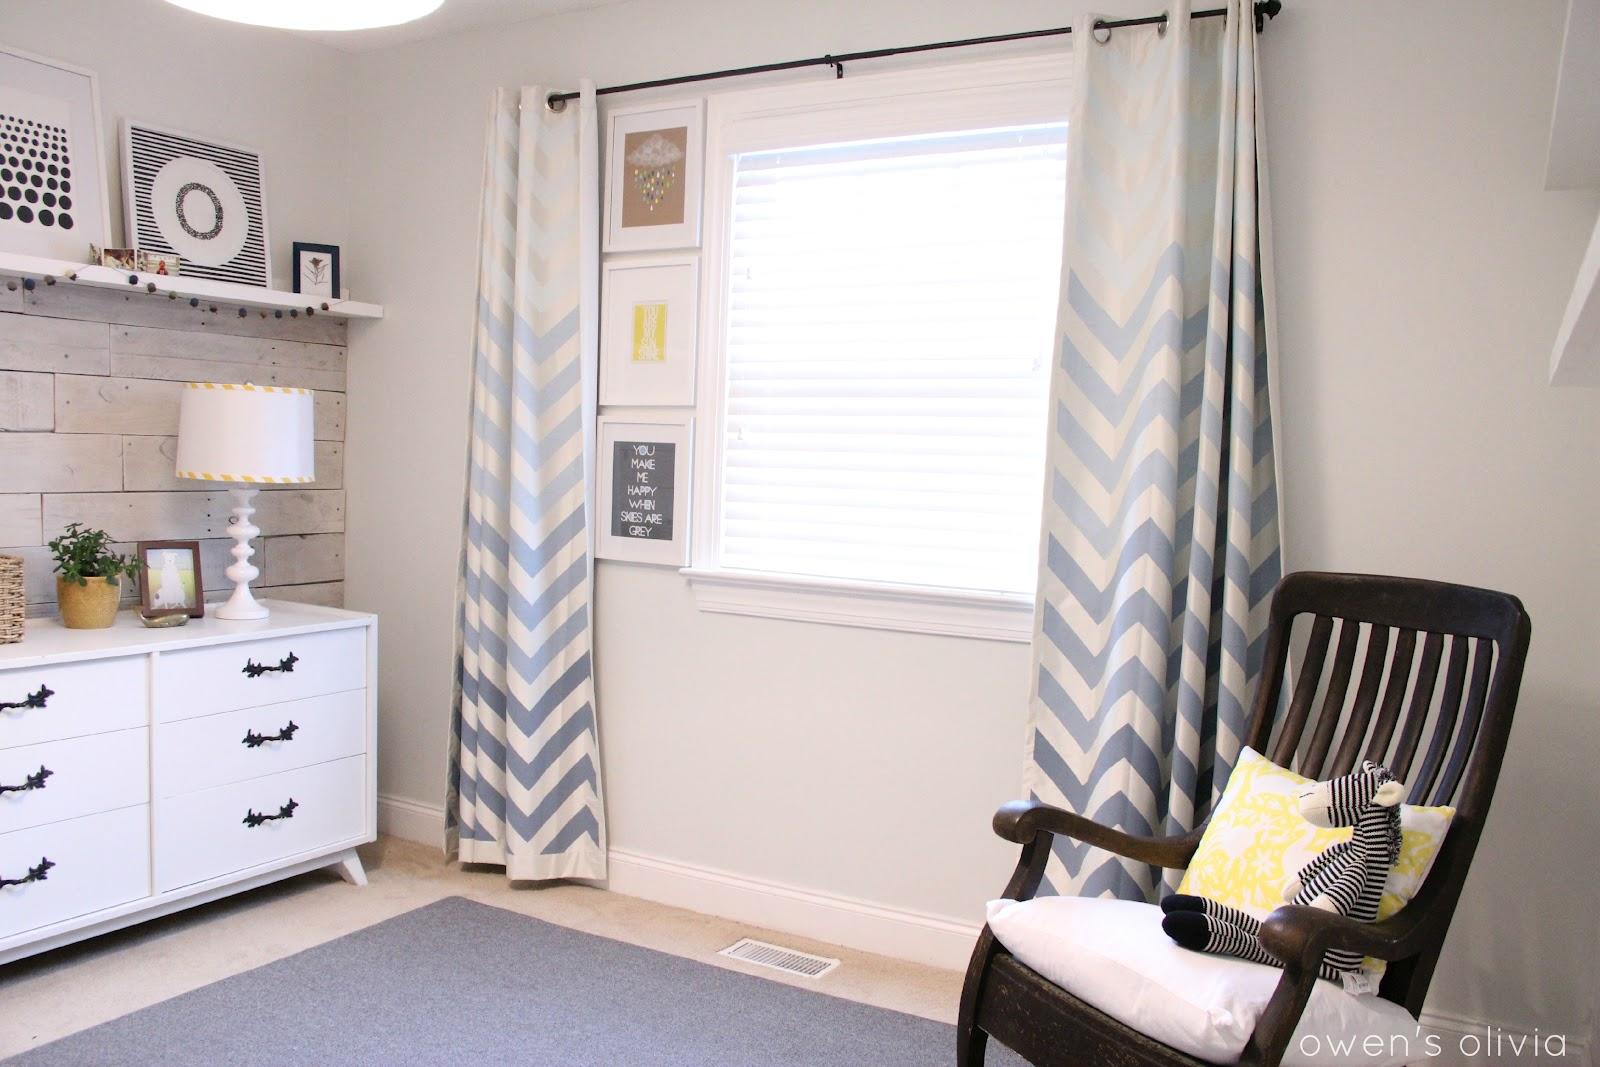 Boy nursery curtains - Boy Nursery Curtains 16